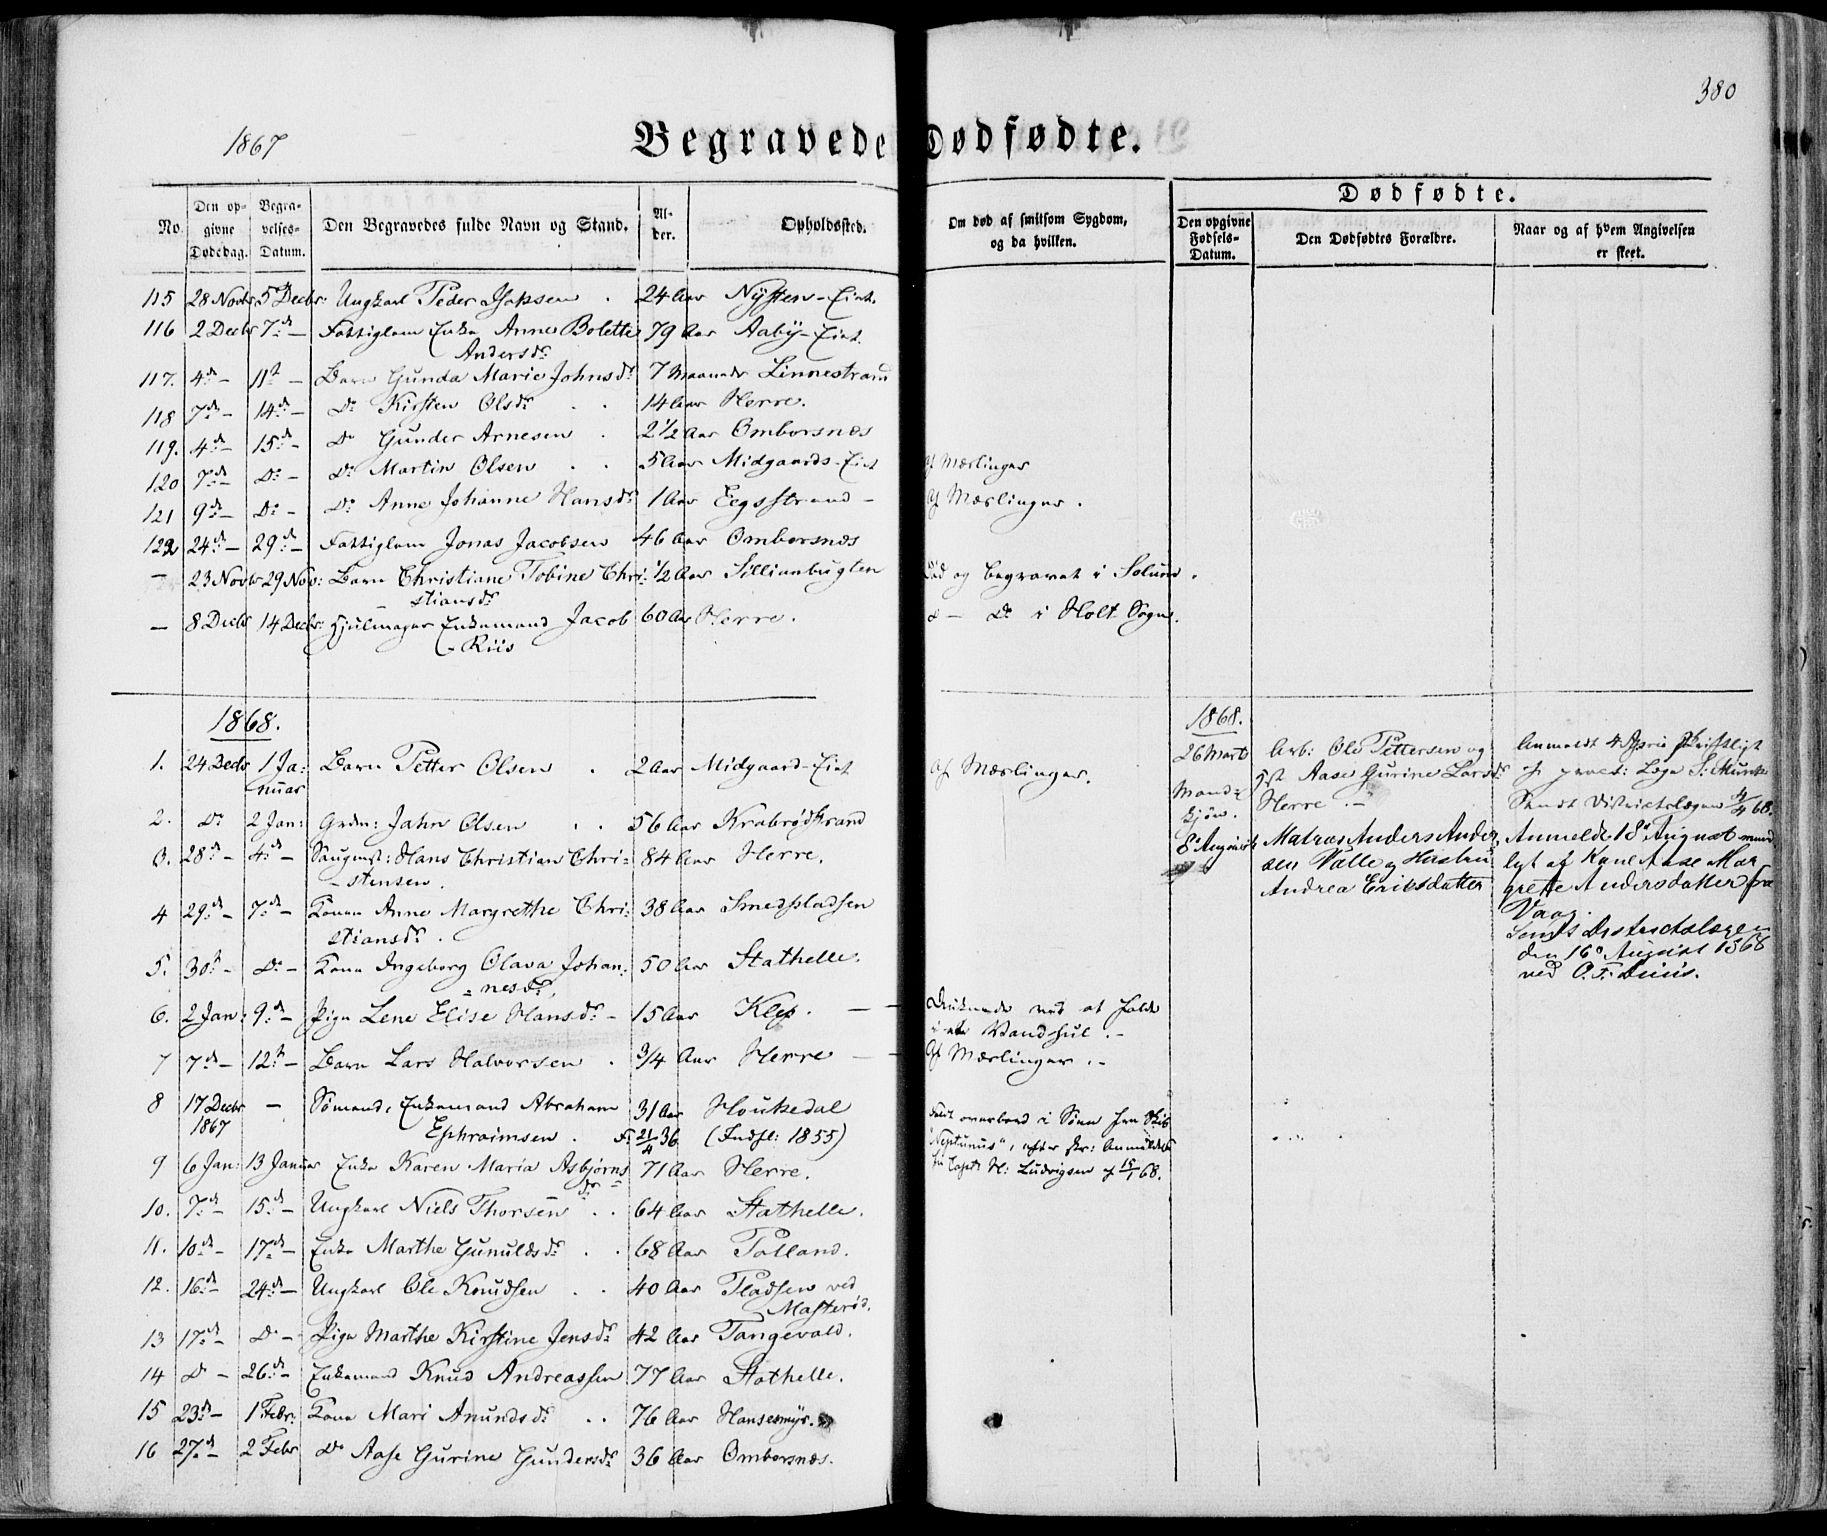 SAKO, Bamble kirkebøker, F/Fa/L0005: Ministerialbok nr. I 5, 1854-1869, s. 380